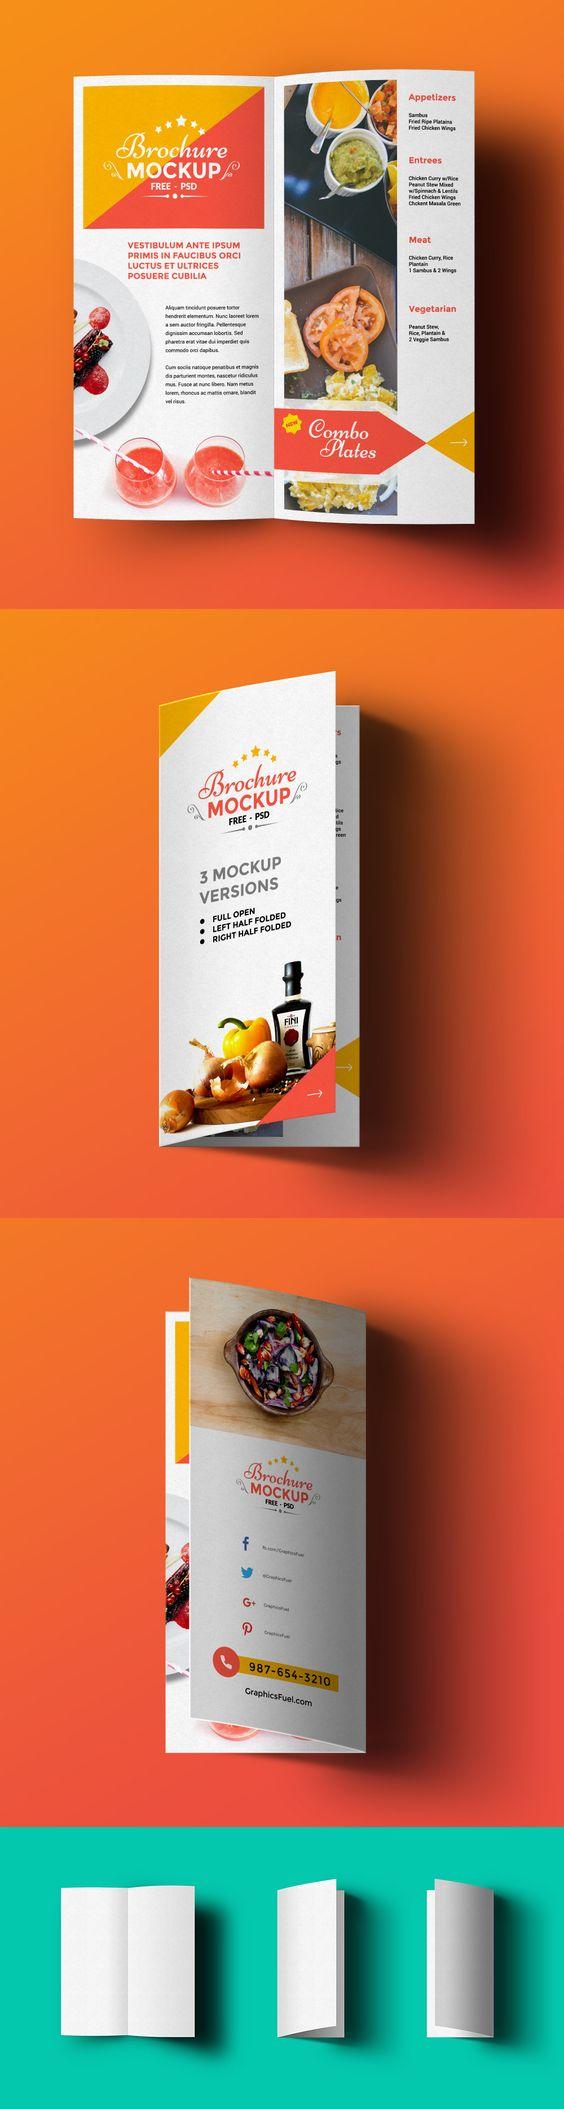 Free Bi-fold Brochure Mockup PSD (62.1 MB)   graphicsfuel.com   #free #photoshop #mockup